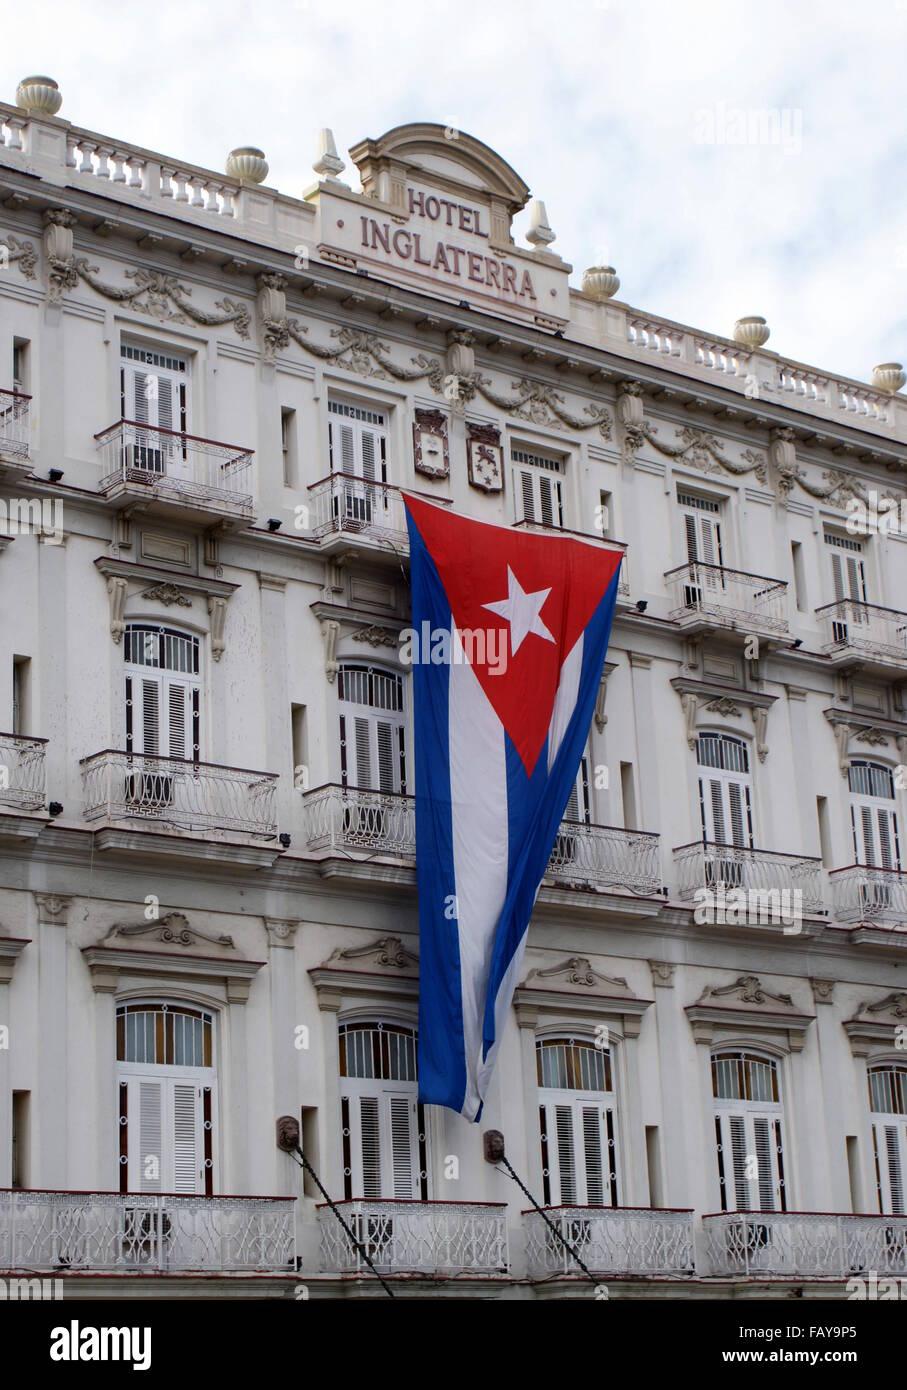 Hotel Inglaterra, Havana, Cuba - Stock Image